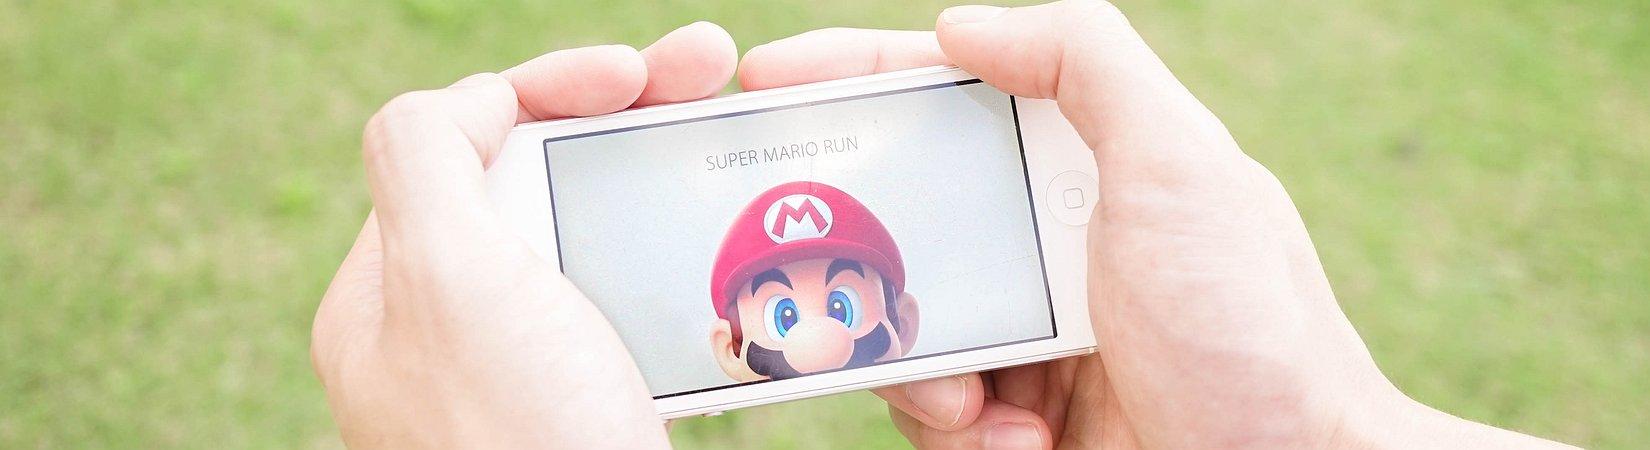 Nintendo's long-awaited Super Mario launch wipes $2 billion off its market cap